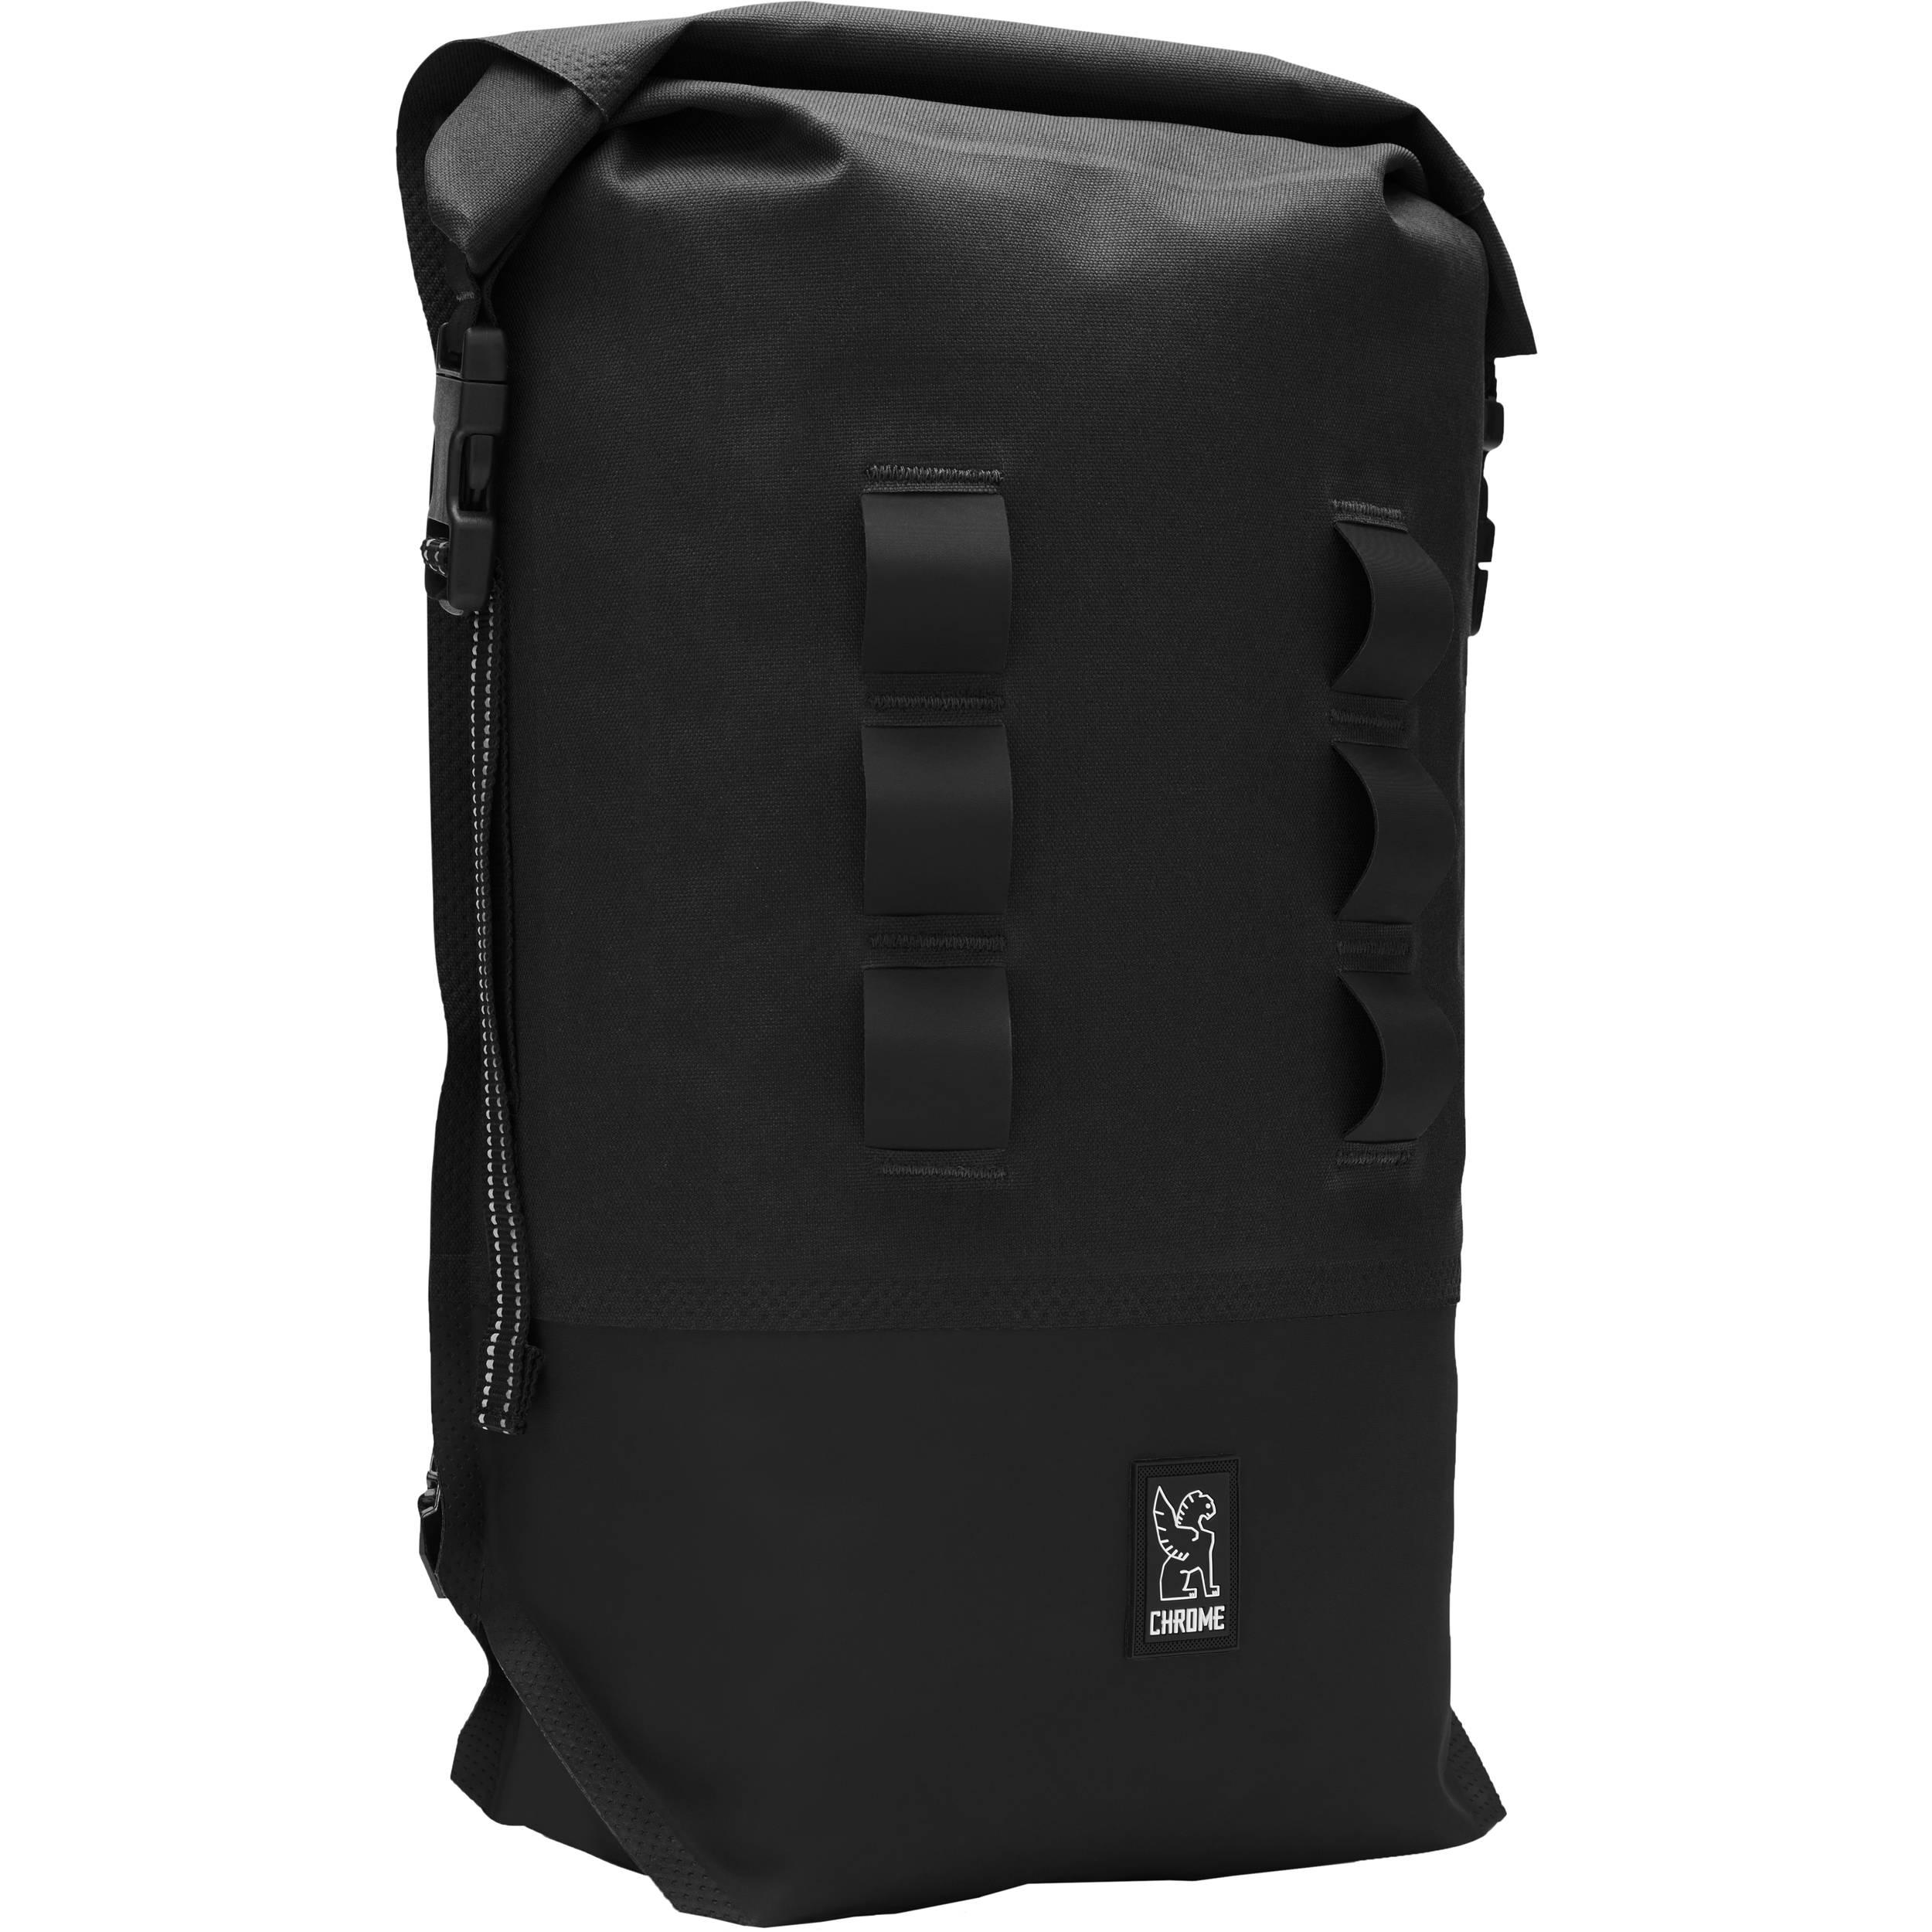 0ffe942879 Chrome Industries Urban Ex Rolltop 18L Backpack BG-217-BKBK-NA